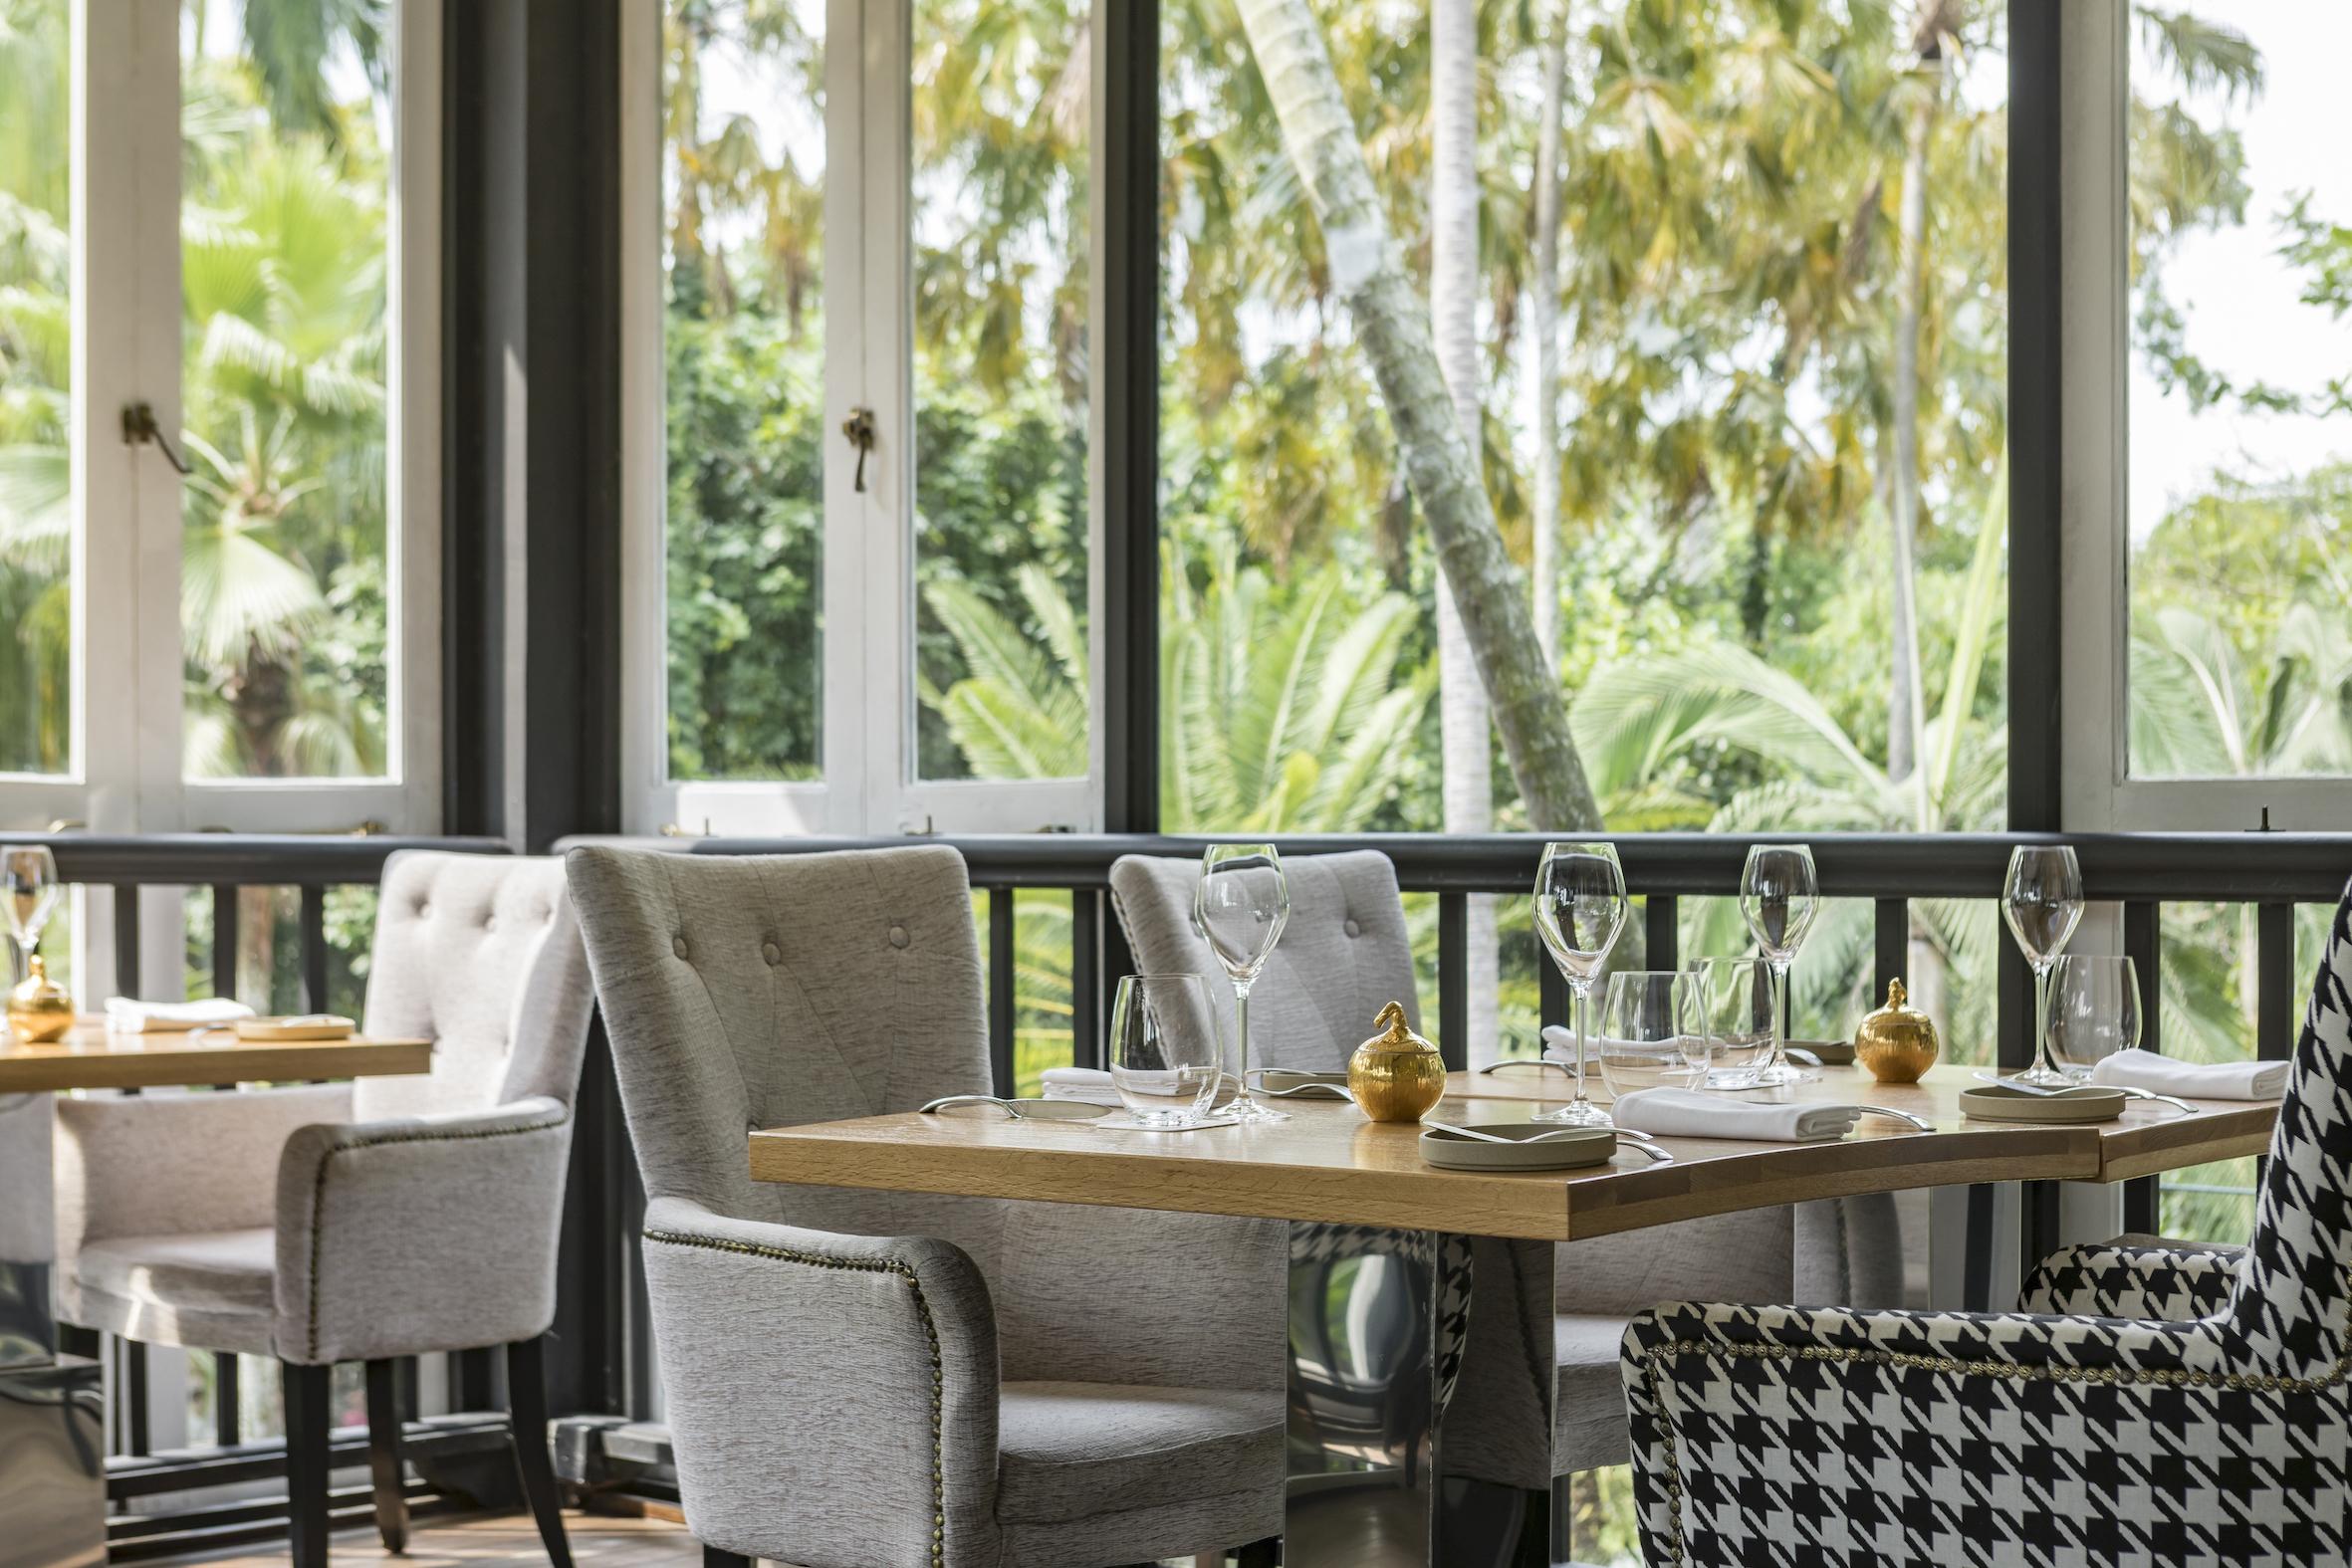 The best garden restaurants in Singapore